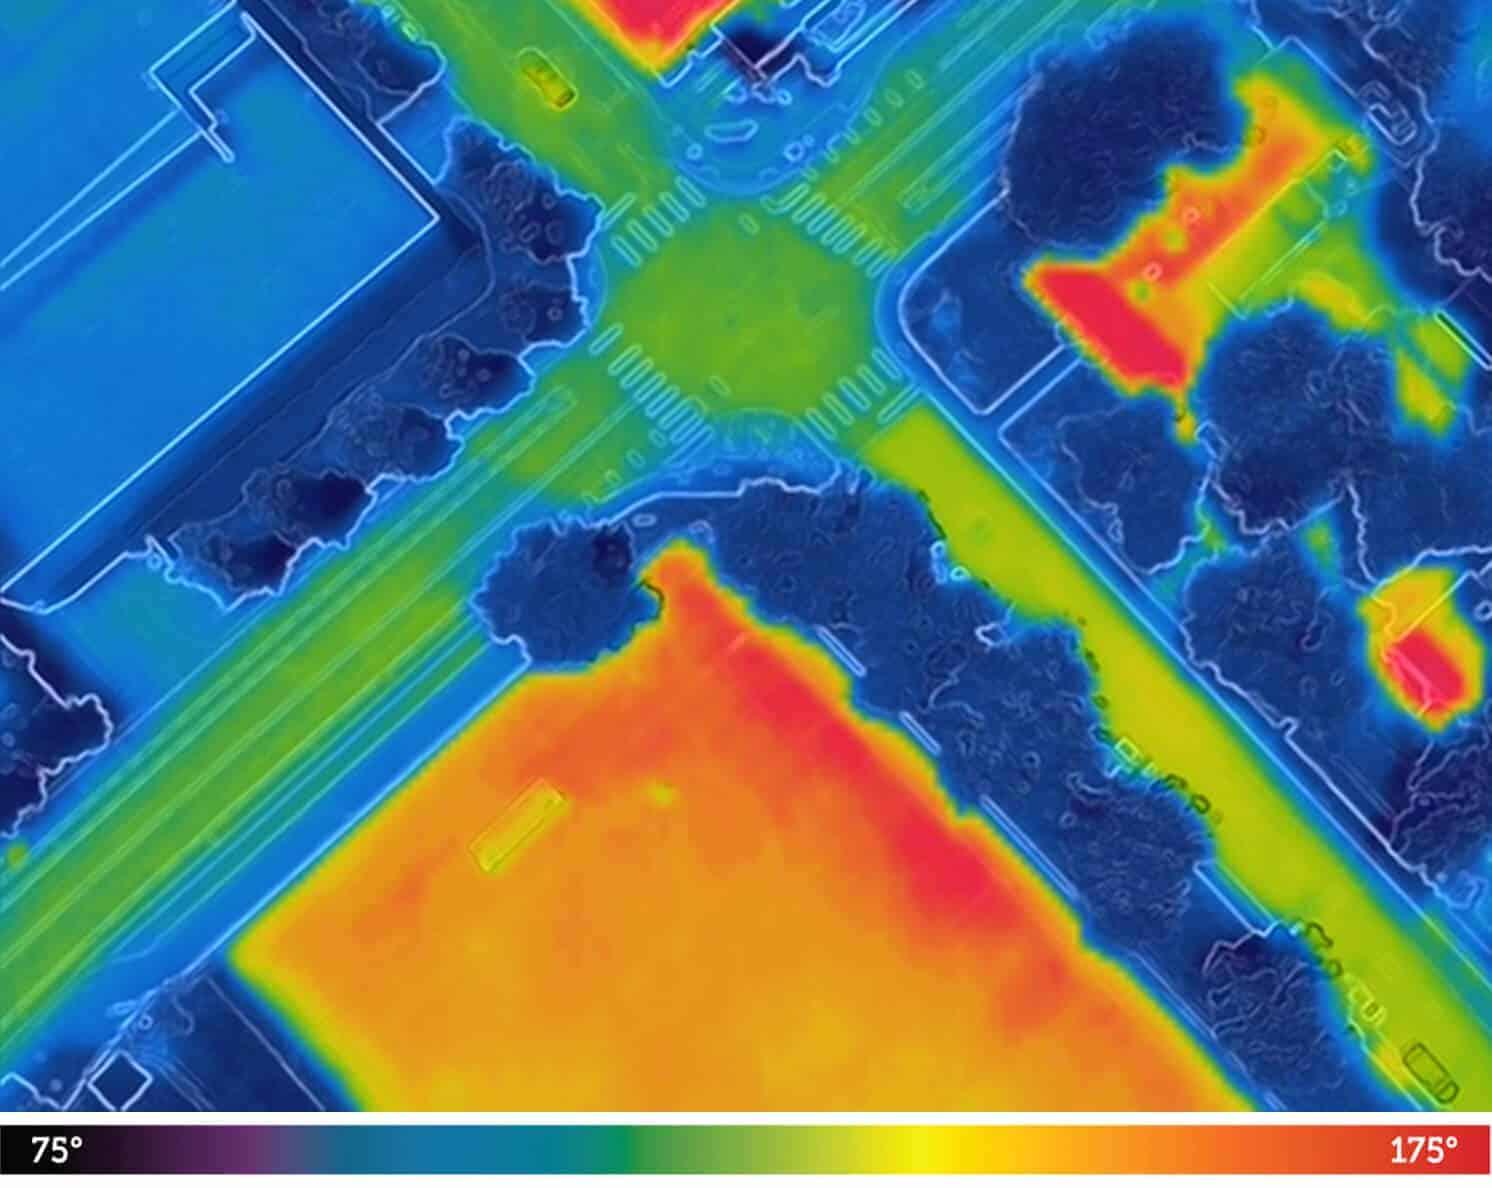 Outdoor temperature: 85F: Field temp 170F, SBR infill